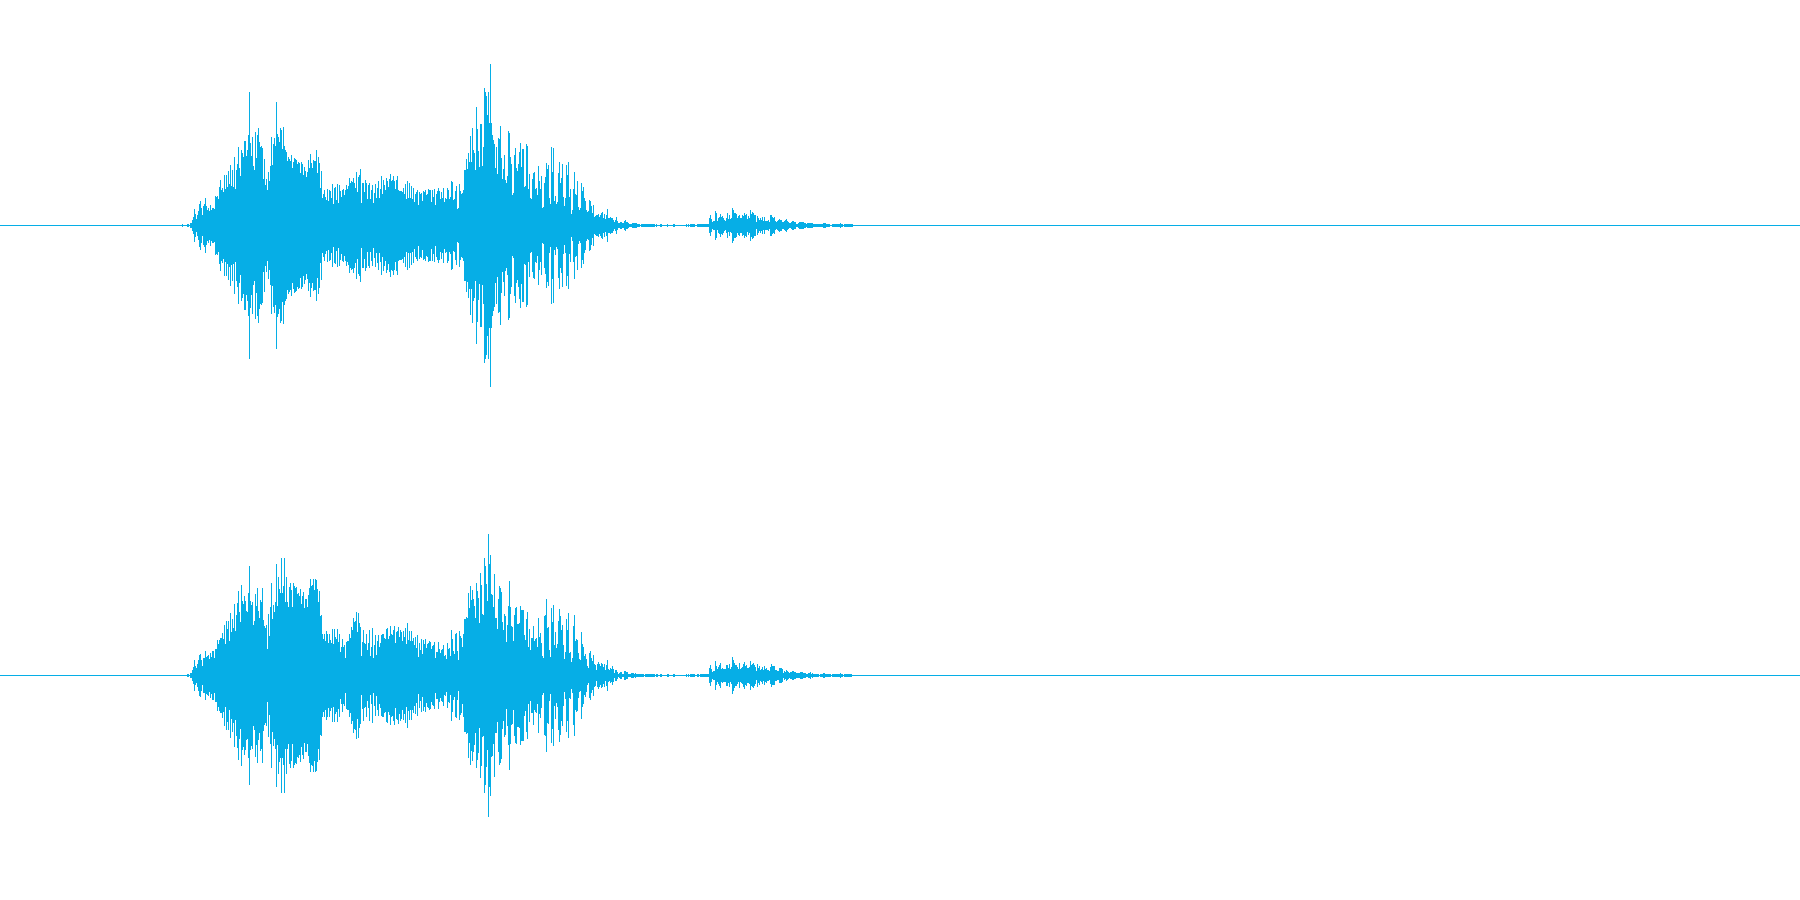 Musicの再生済みの波形